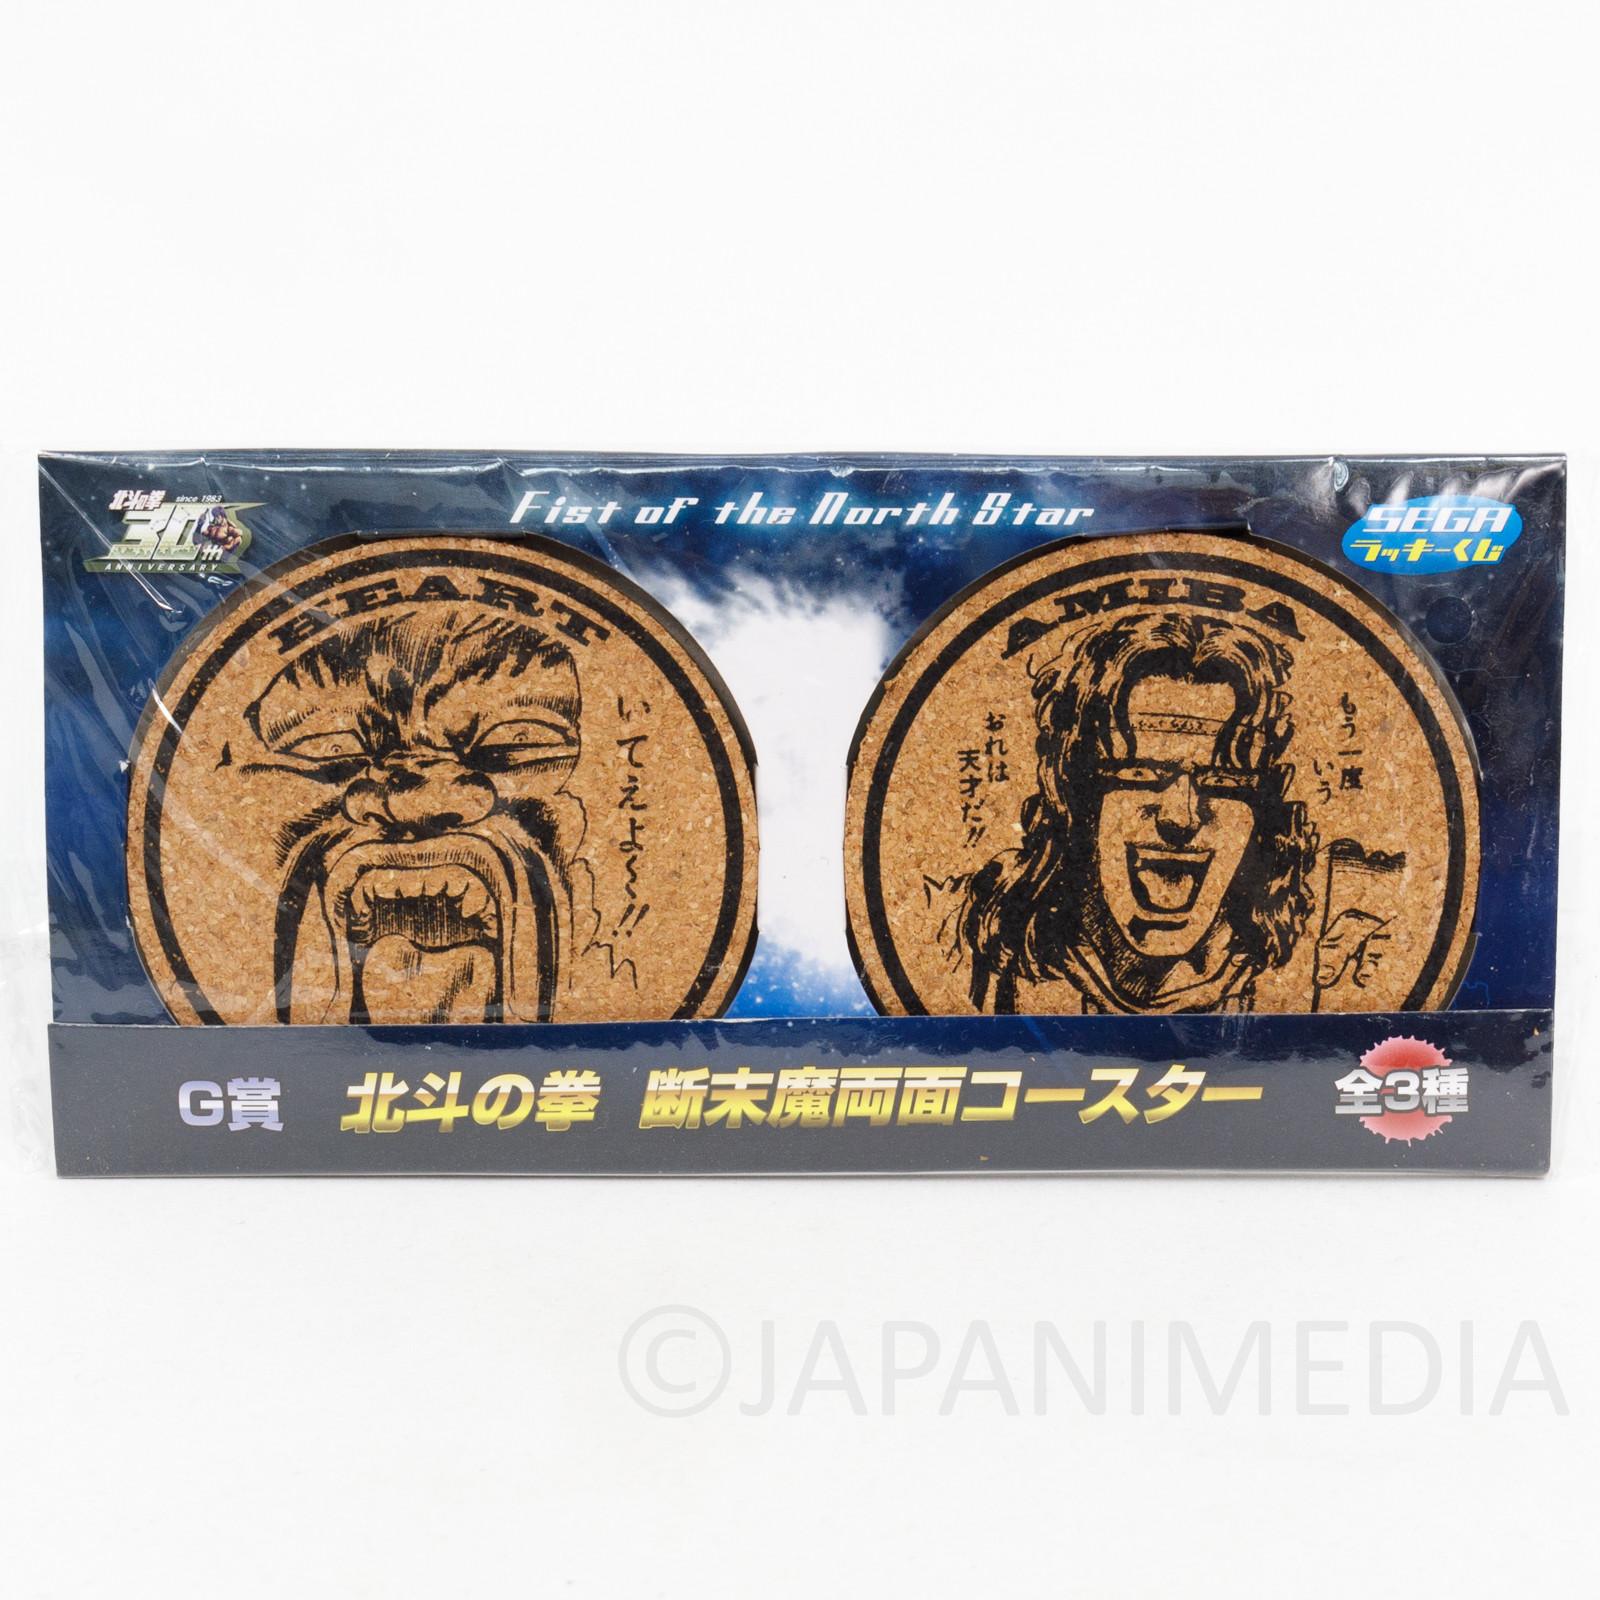 Fist of the North Star Heart & Amiba Cork Coaster Set JAPAN Hokuto no Ken